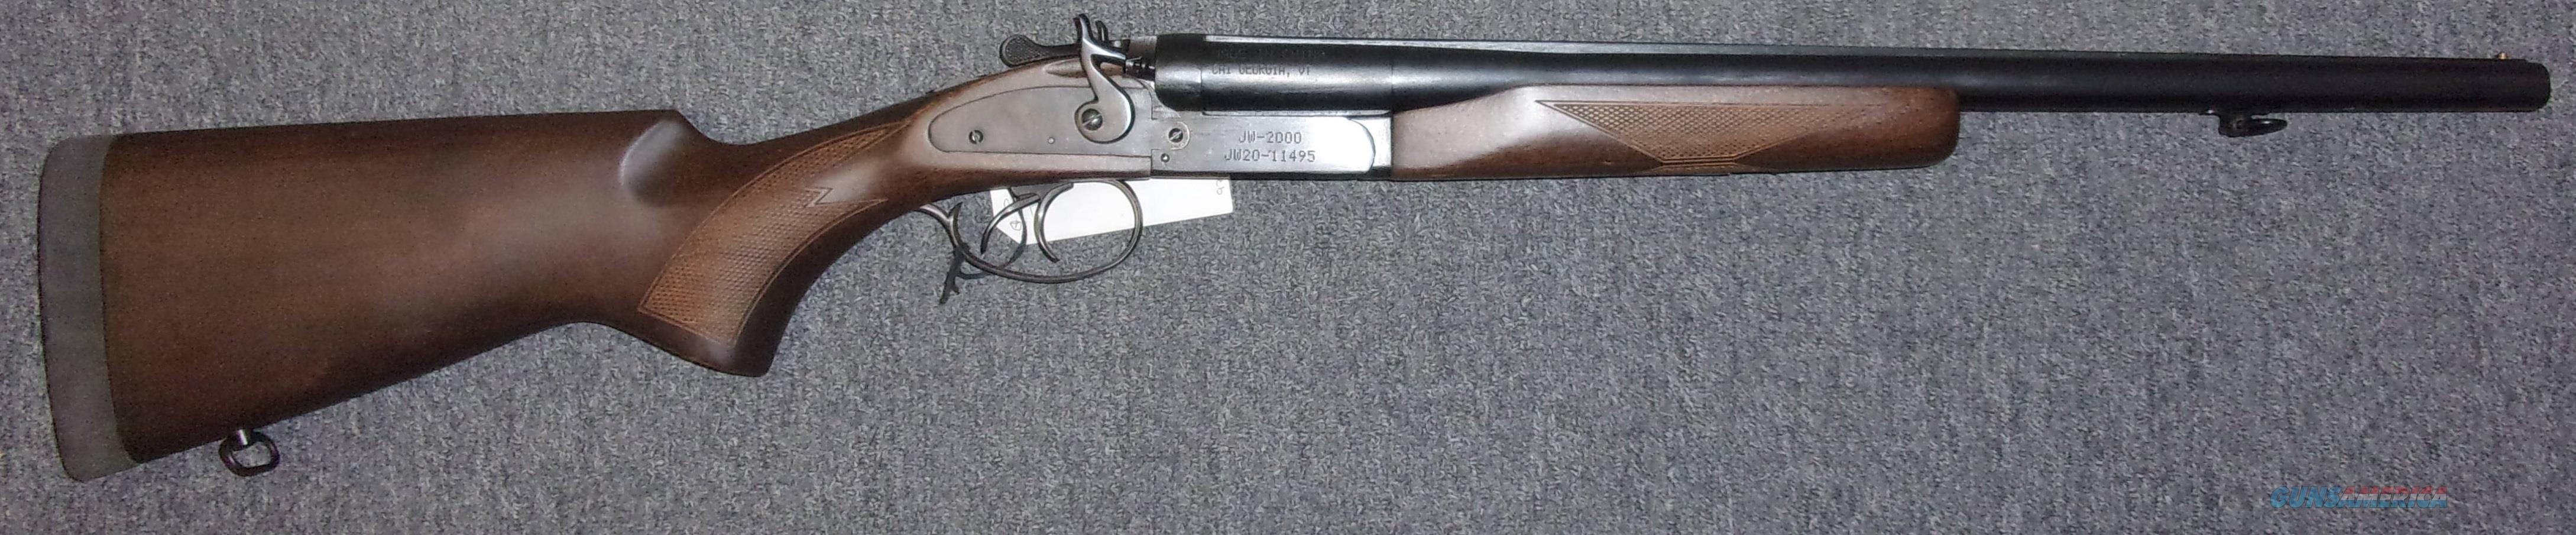 Zhongzhou/C.A.I. JW-2000  Guns > Shotguns > Century International Arms - Shotguns > Shotguns